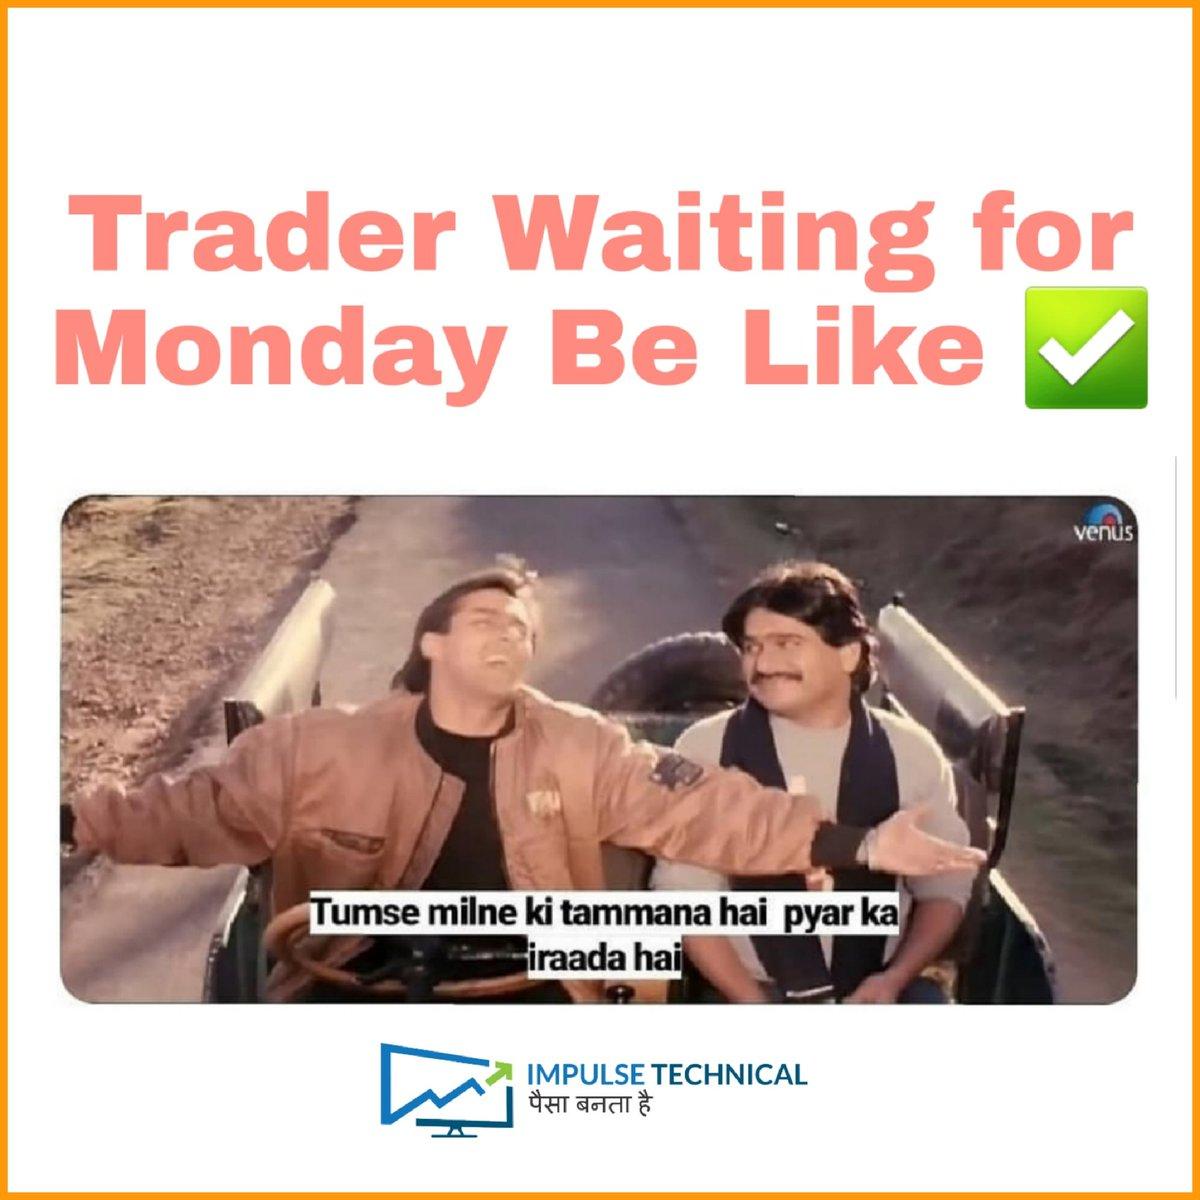 Hota hai , Hot Hai..  Trading mein , No Stop Loss , No Profit ..  Only Trading   #mondayquotes #mondaymood #tradingonmonday #mondaymotivation #stockmarketquotes #tradingquotes #sharemarketmeme<br>http://pic.twitter.com/xKtIfqwnZm